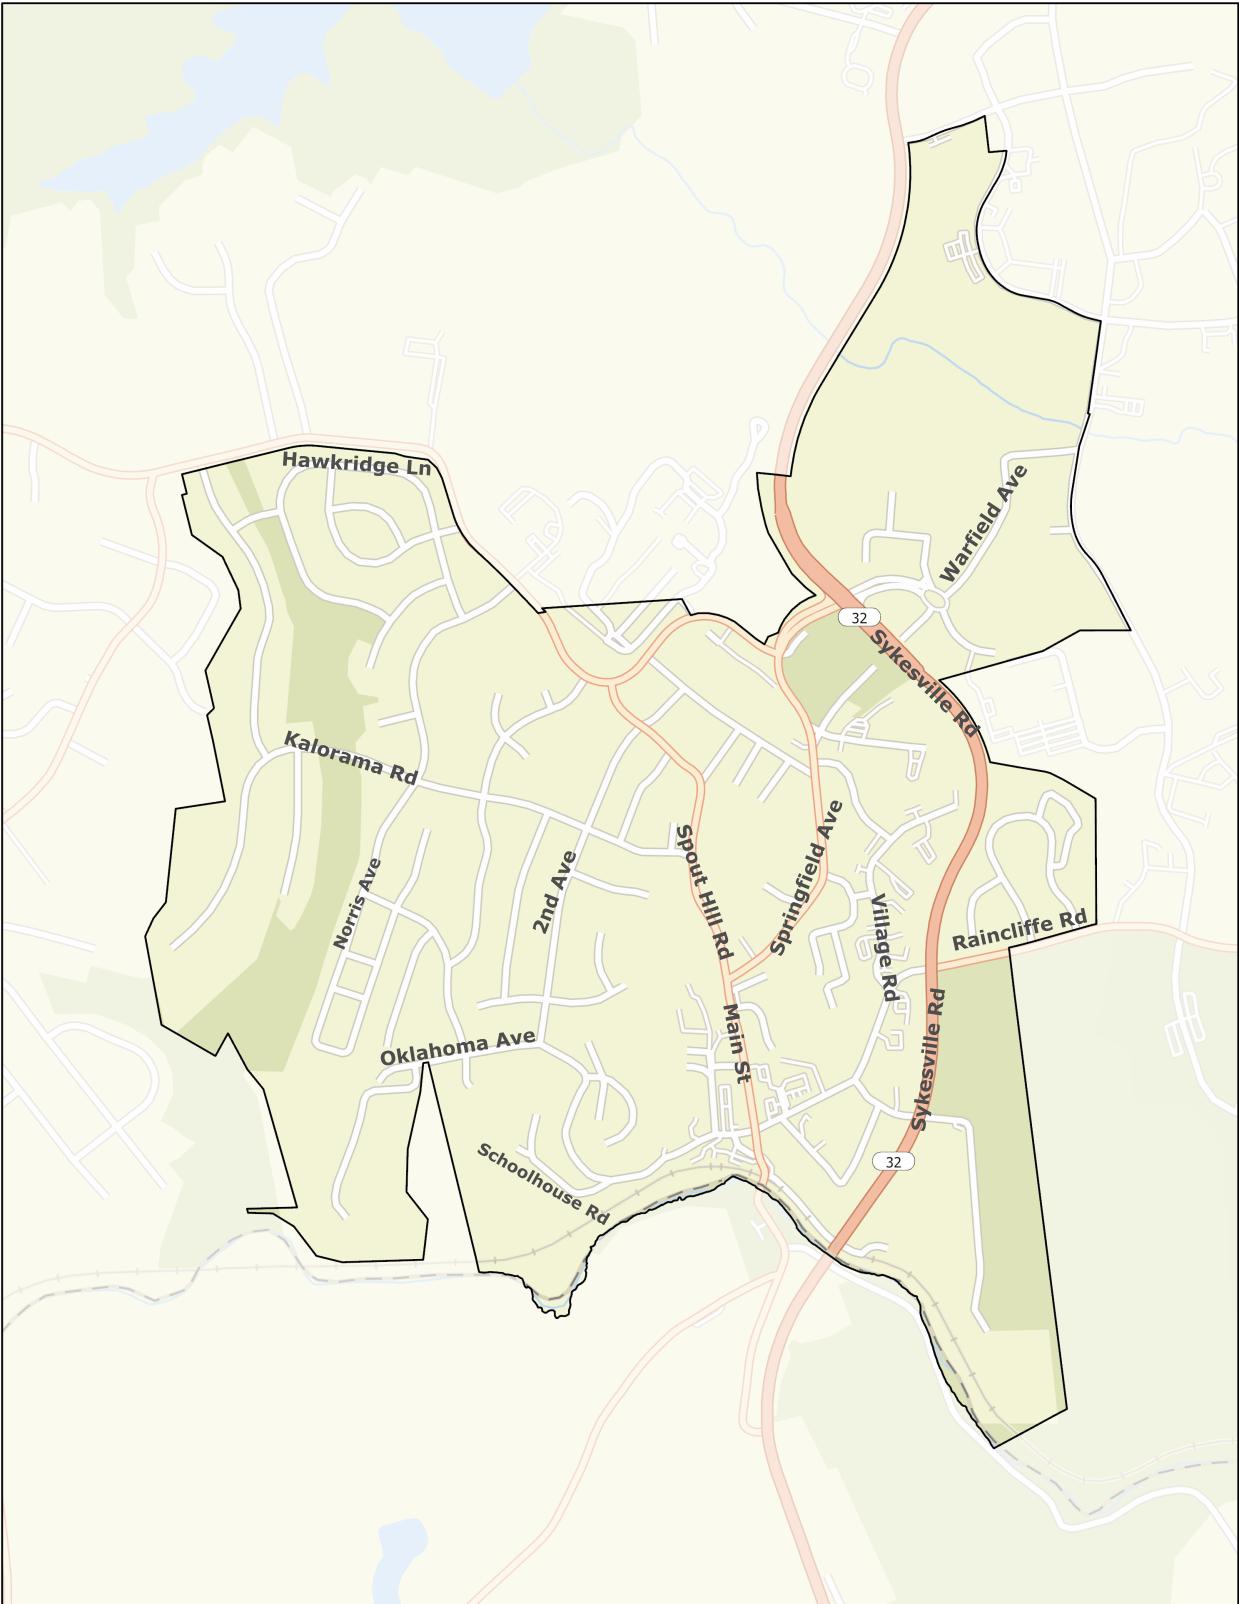 <strong>Town of Sykesville (Municipal Boundary)</strong>